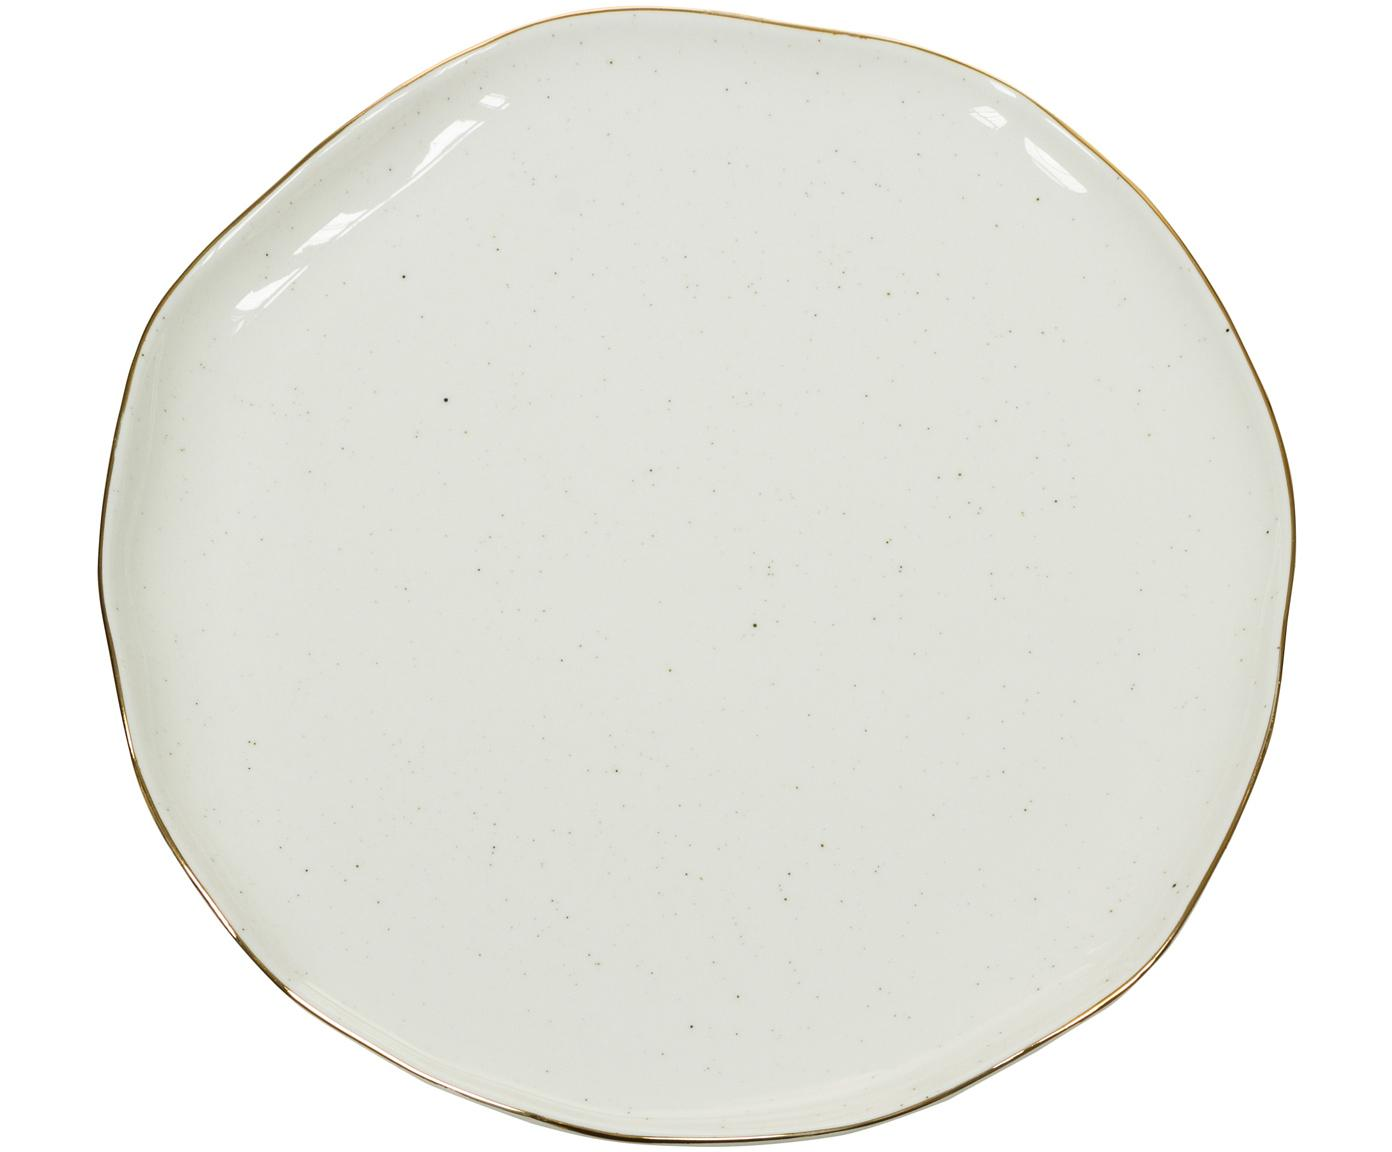 Handgefertigte Frühstücksteller Bol mit Goldrand, 2 Stück, Porzellan, Cremeweiß, Ø 19 x H 3 cm